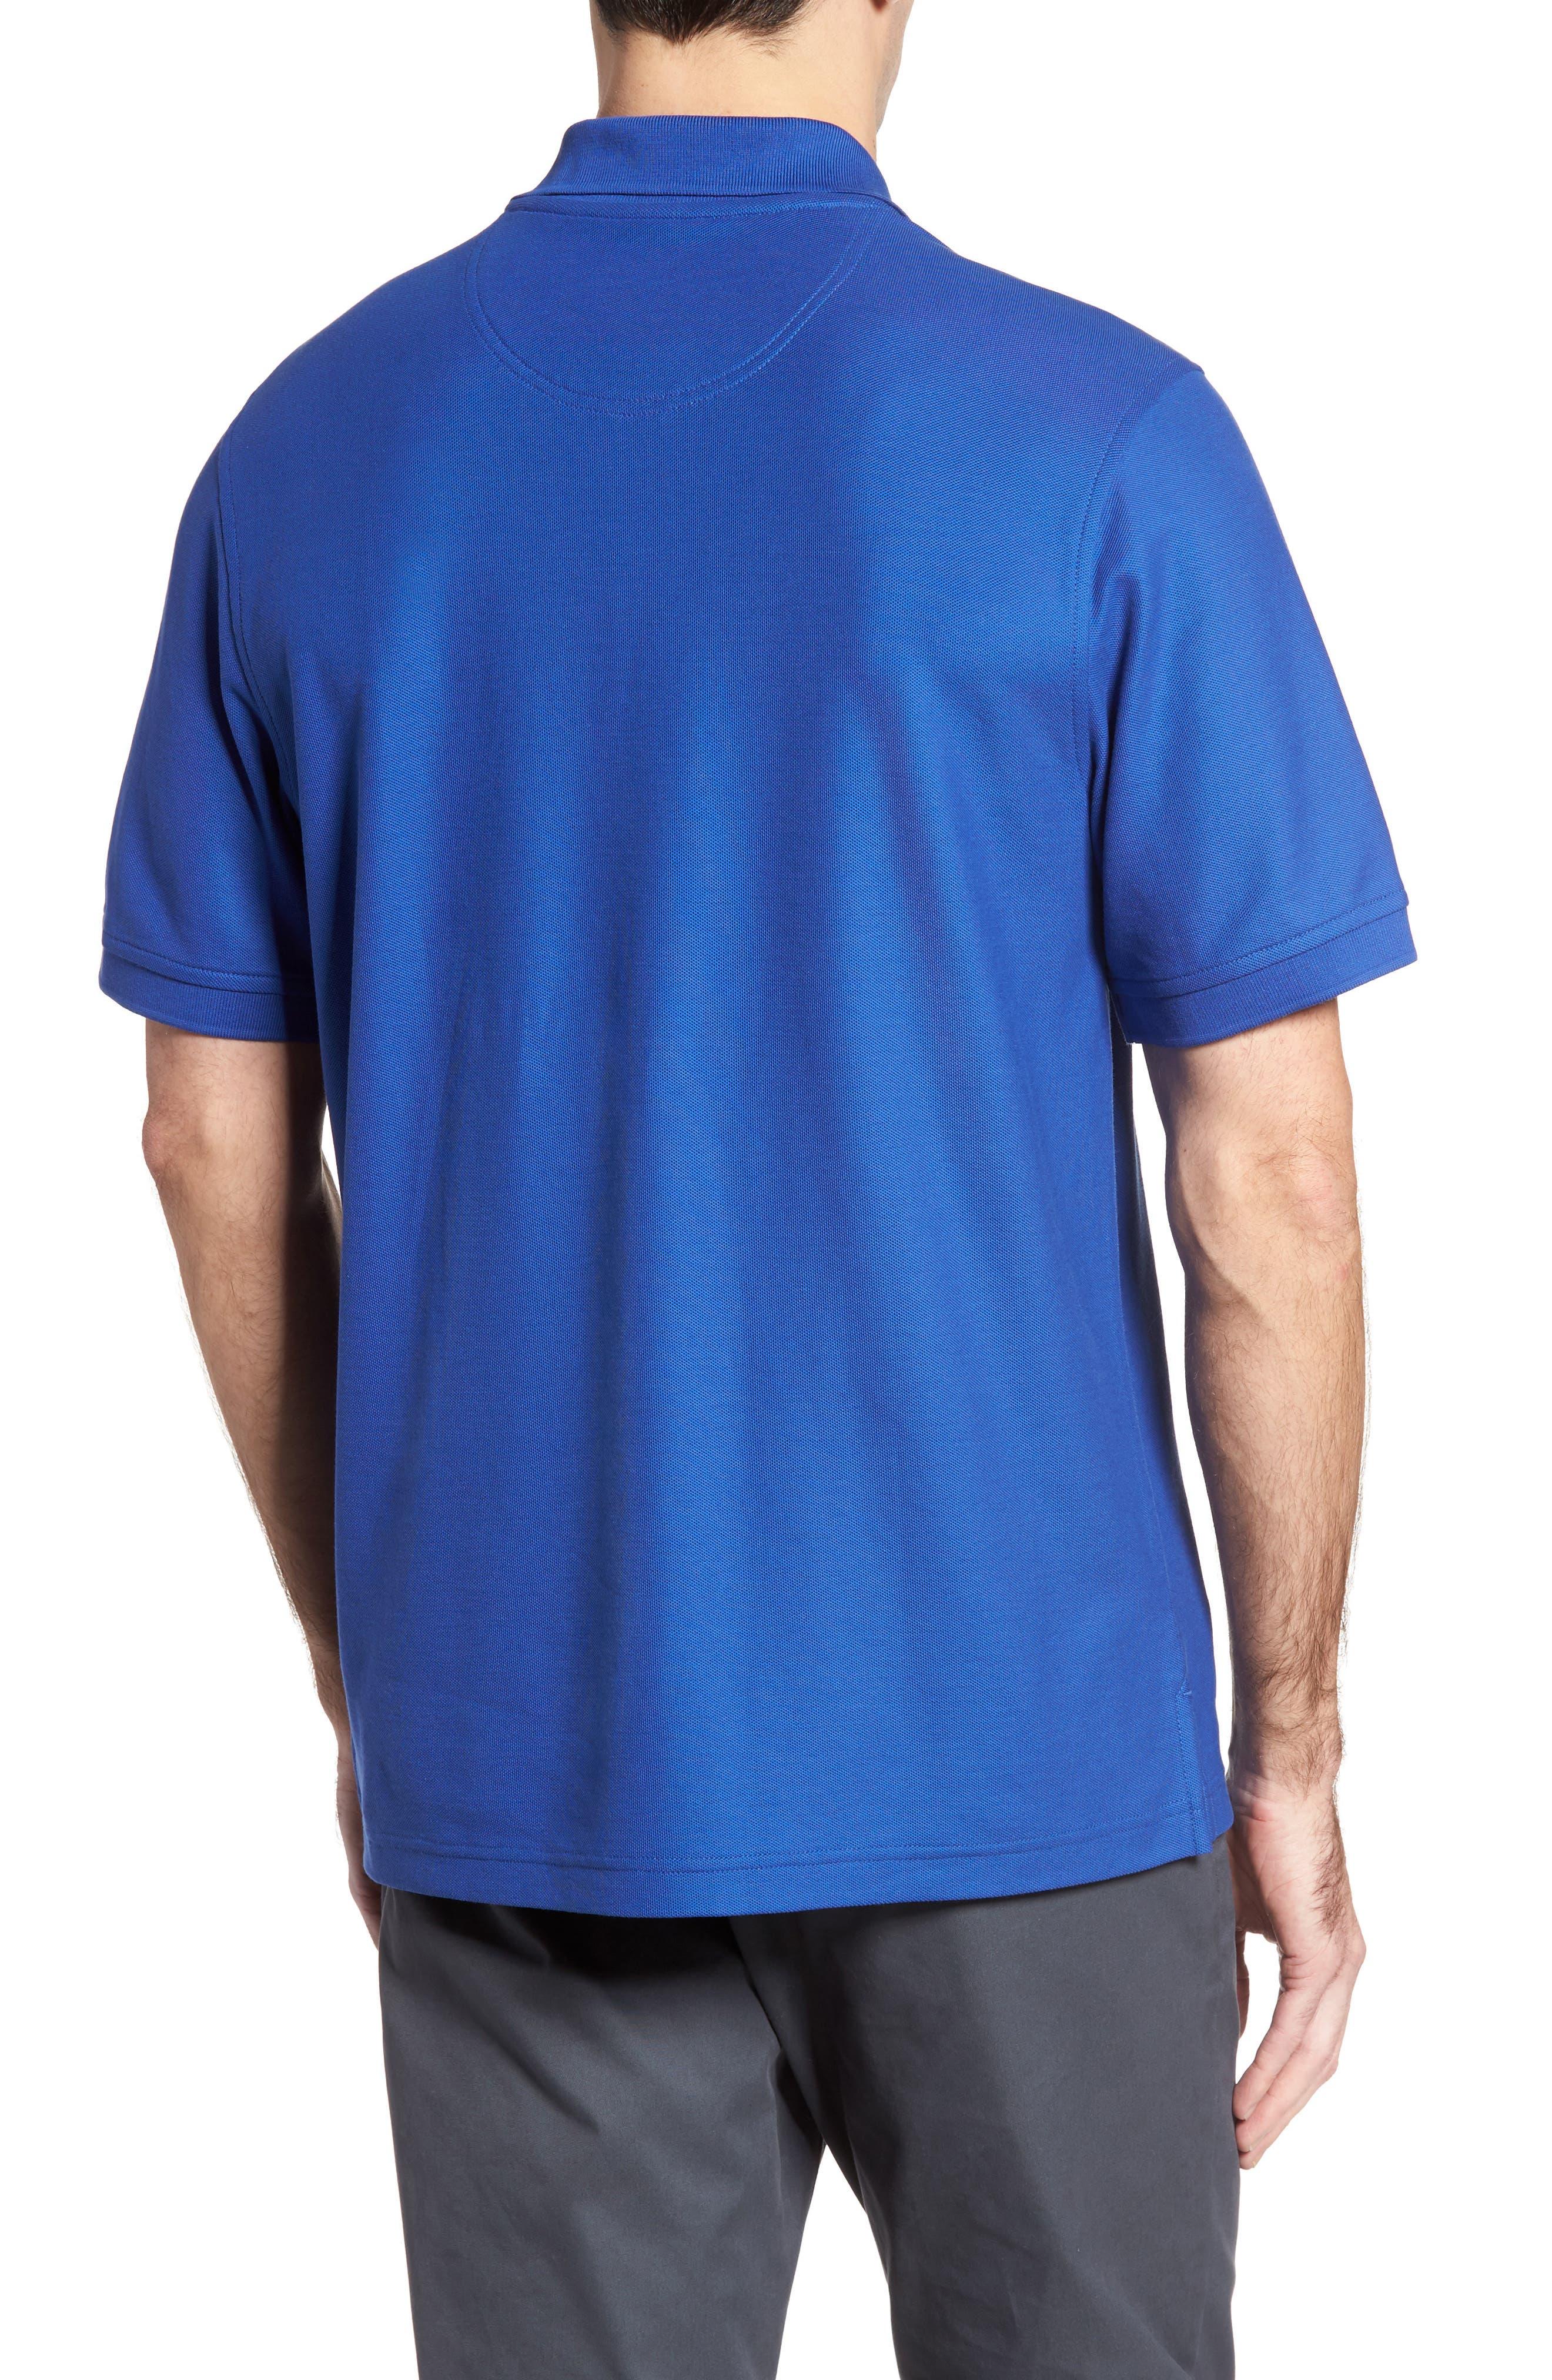 Alternate Image 2  - Nordstrom Men's Shop 'Classic' Regular Fit Piqué Polo (Big)